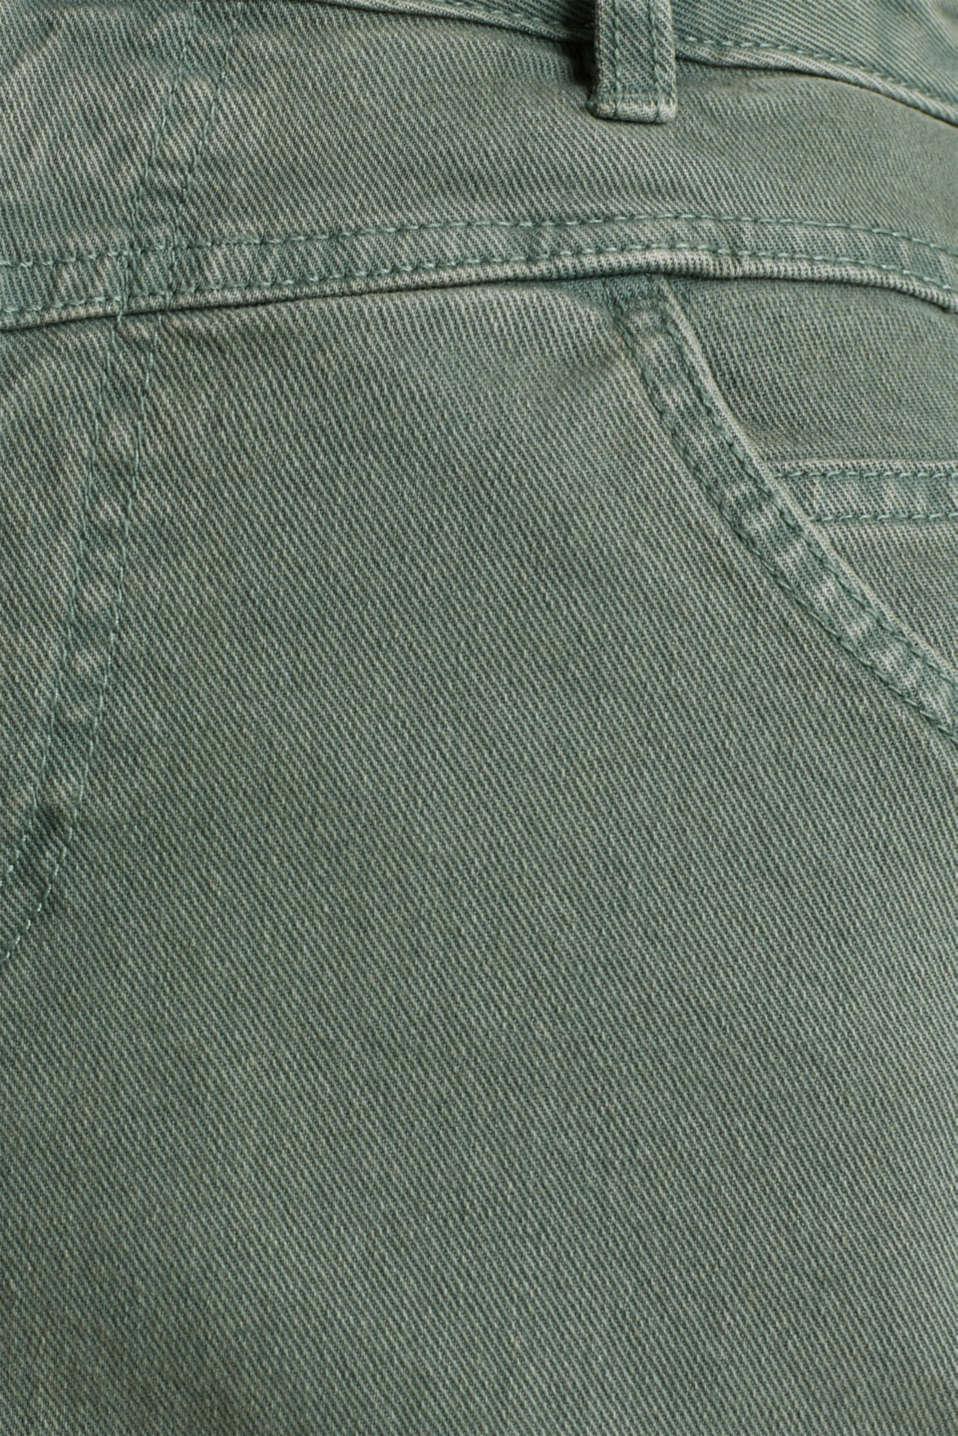 Stretch cotton skirt, KHAKI GREEN, detail image number 4